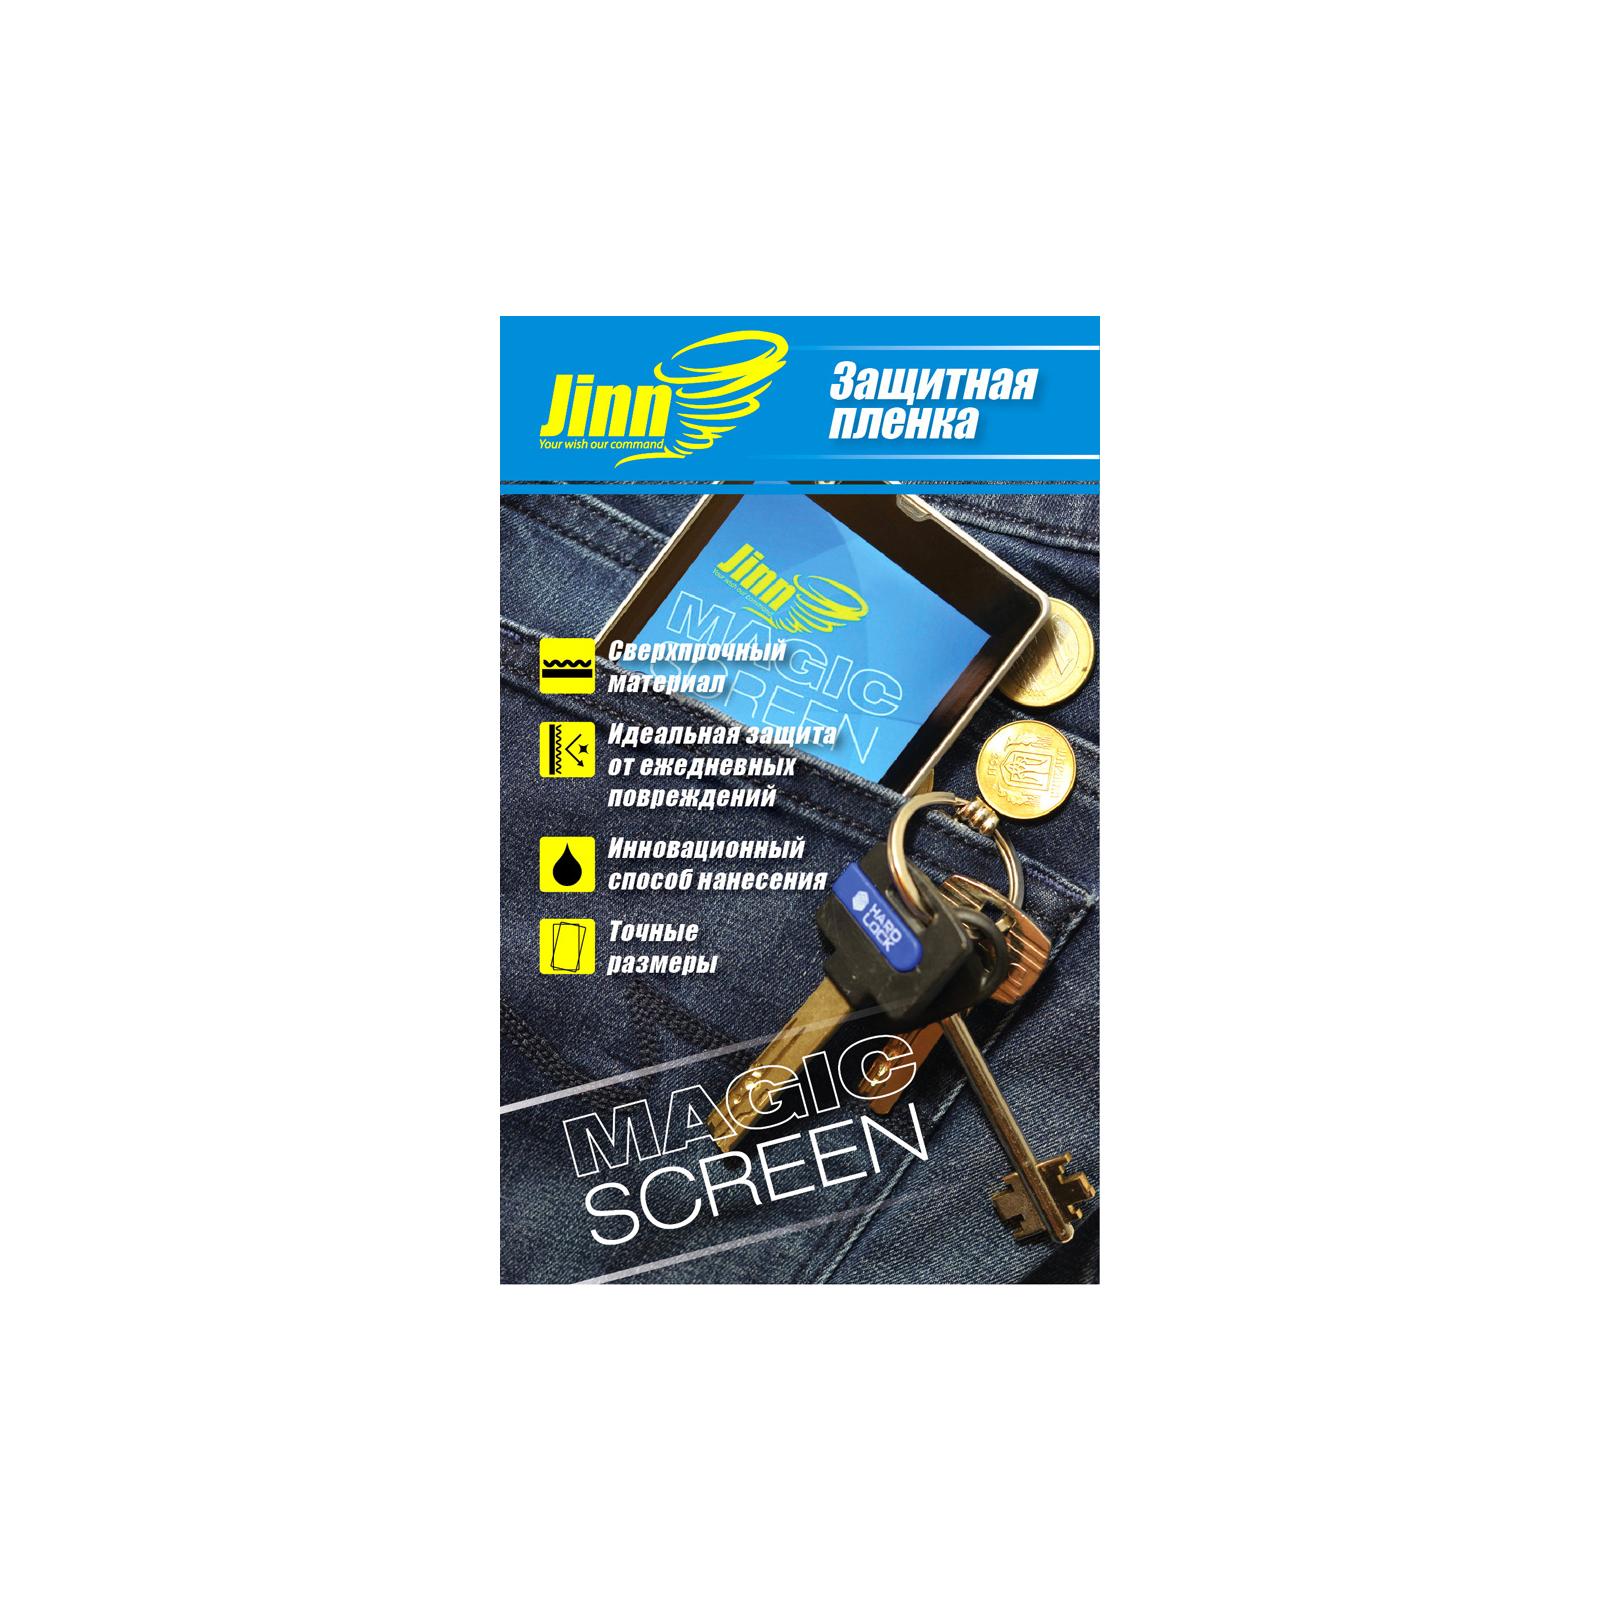 Пленка защитная JINN ультрапрочная Magic Screen для LG Optimus L5 E615 Dual (LG Optimus L5 Dual front)